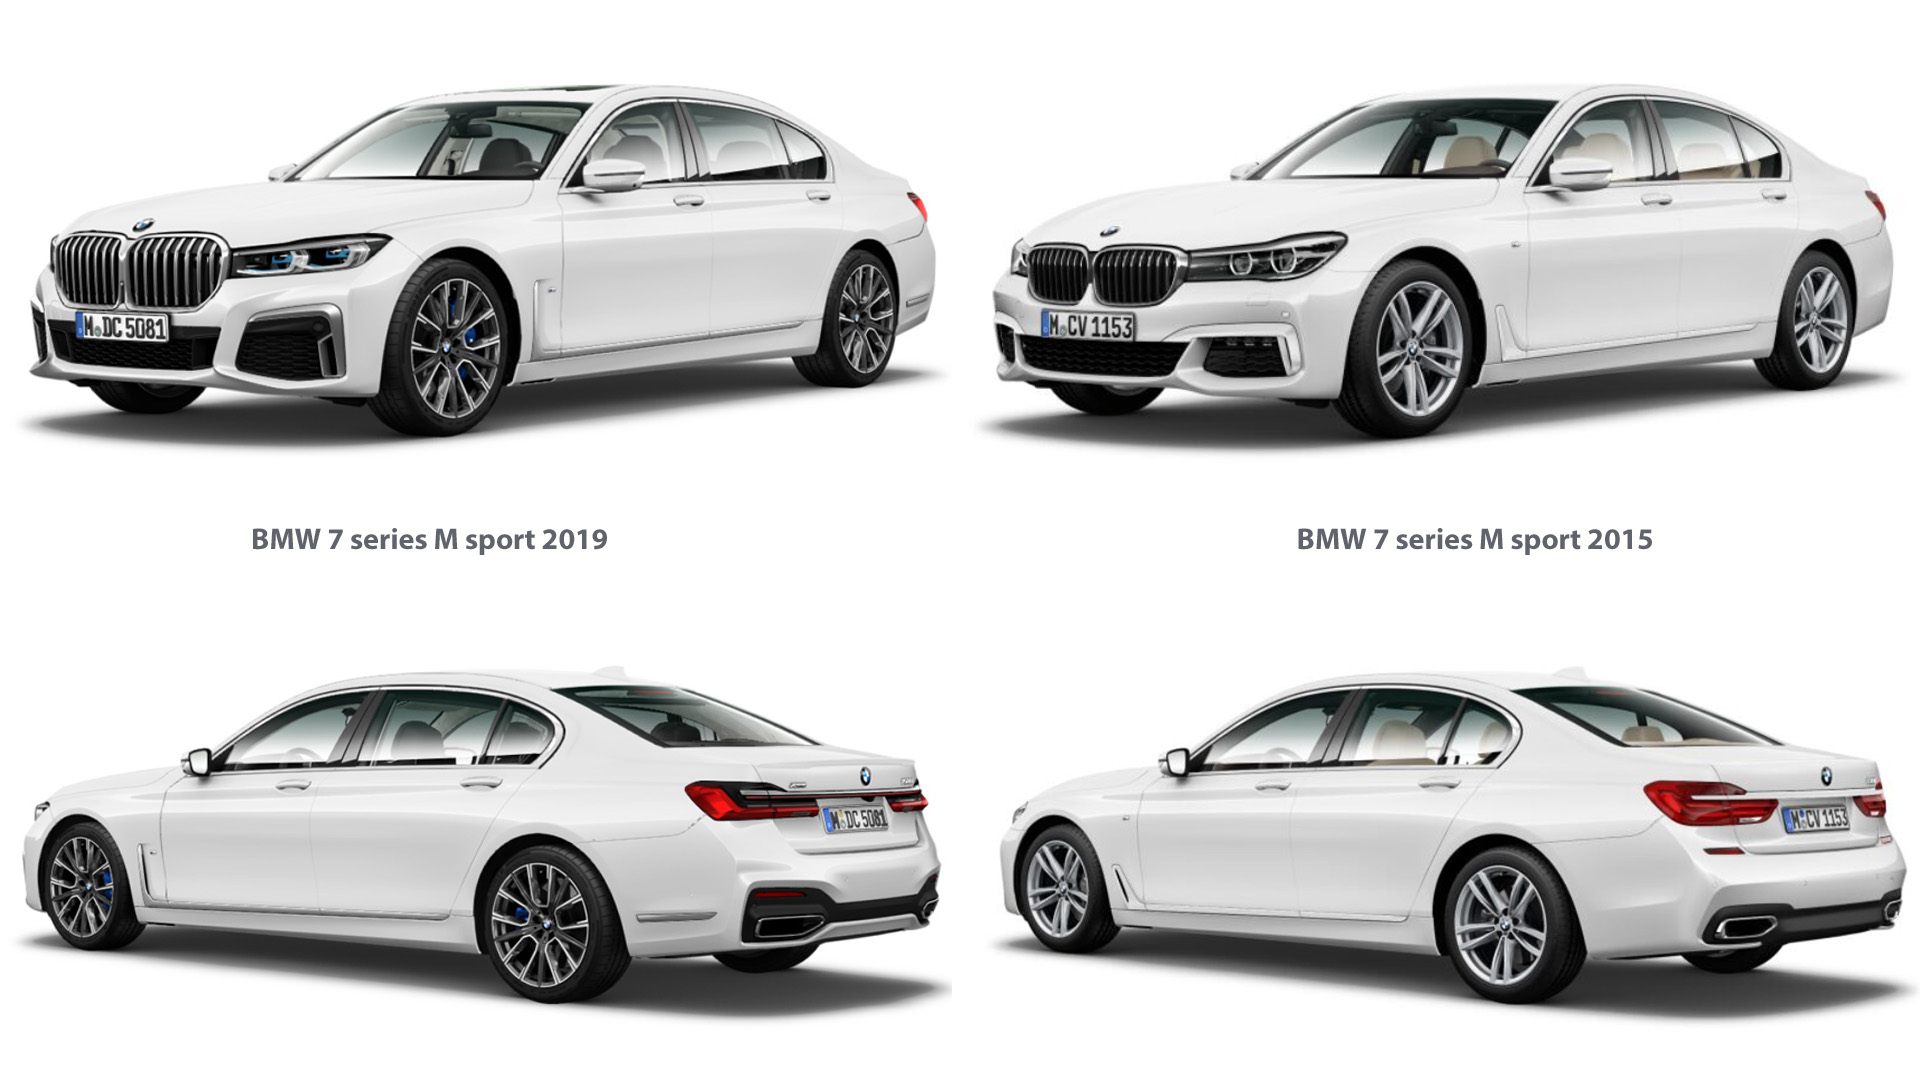 BMW 7 series M sport 2019